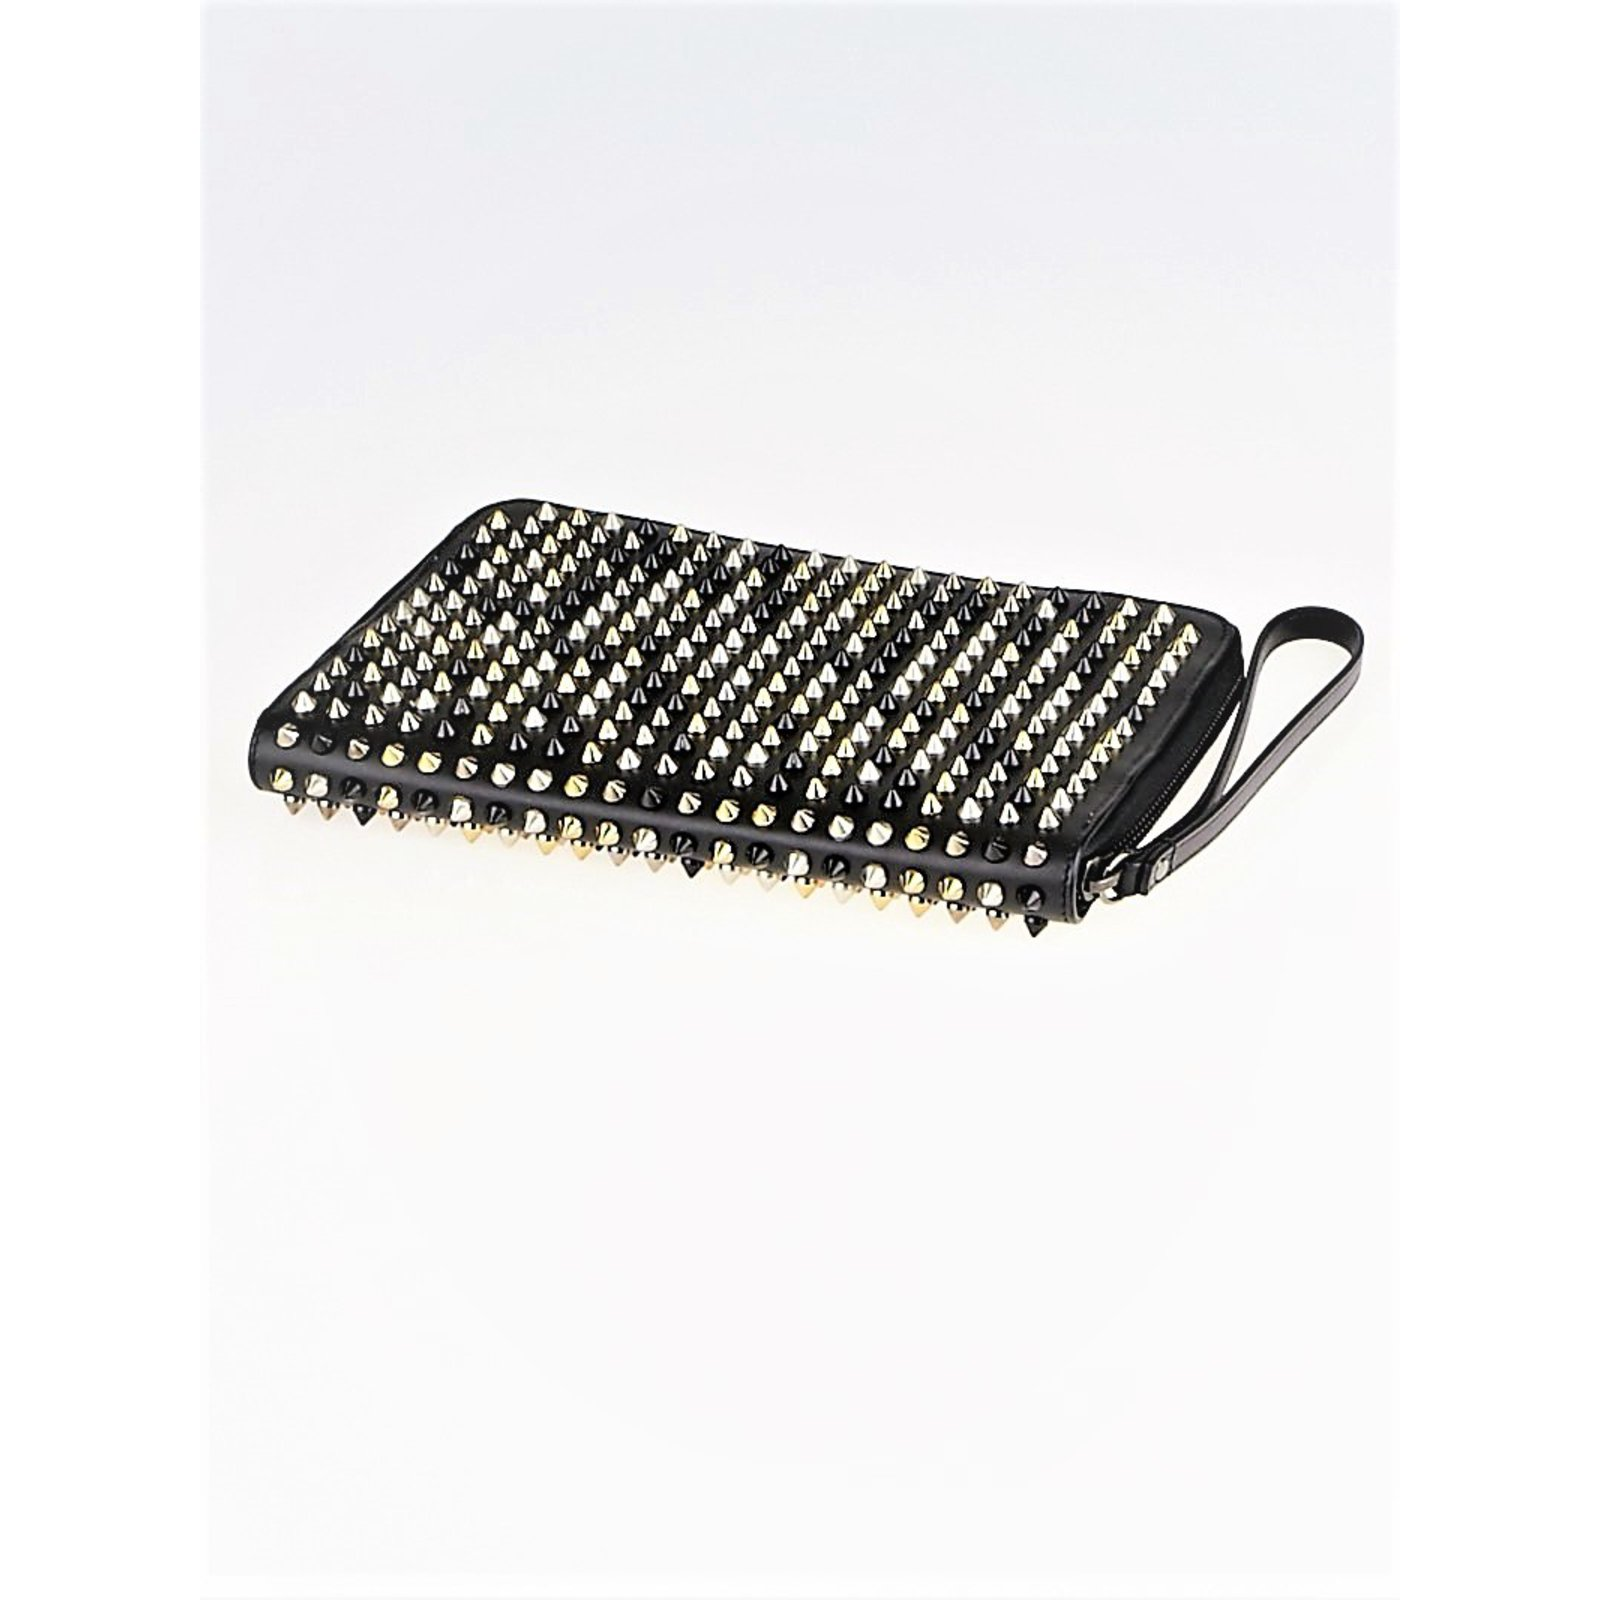 94a92f962748 Christian Louboutin Clutch iPad Case Clutch bags Leather Black ref.70466 -  Joli Closet